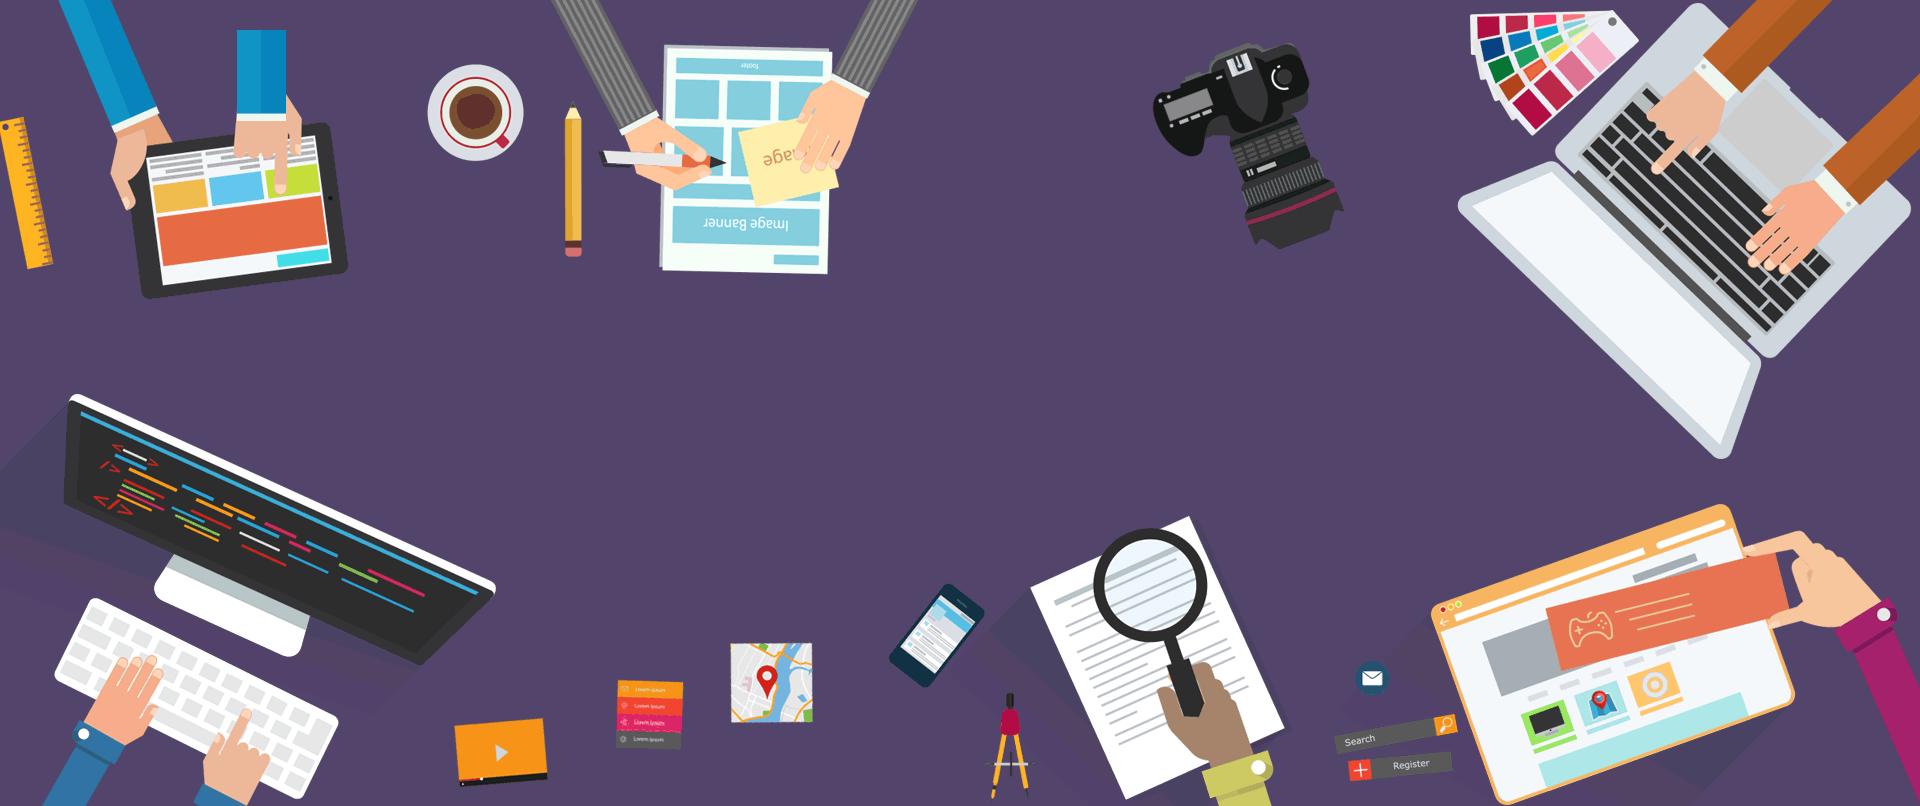 Mobile-Friendly Web Development and Graphic Design